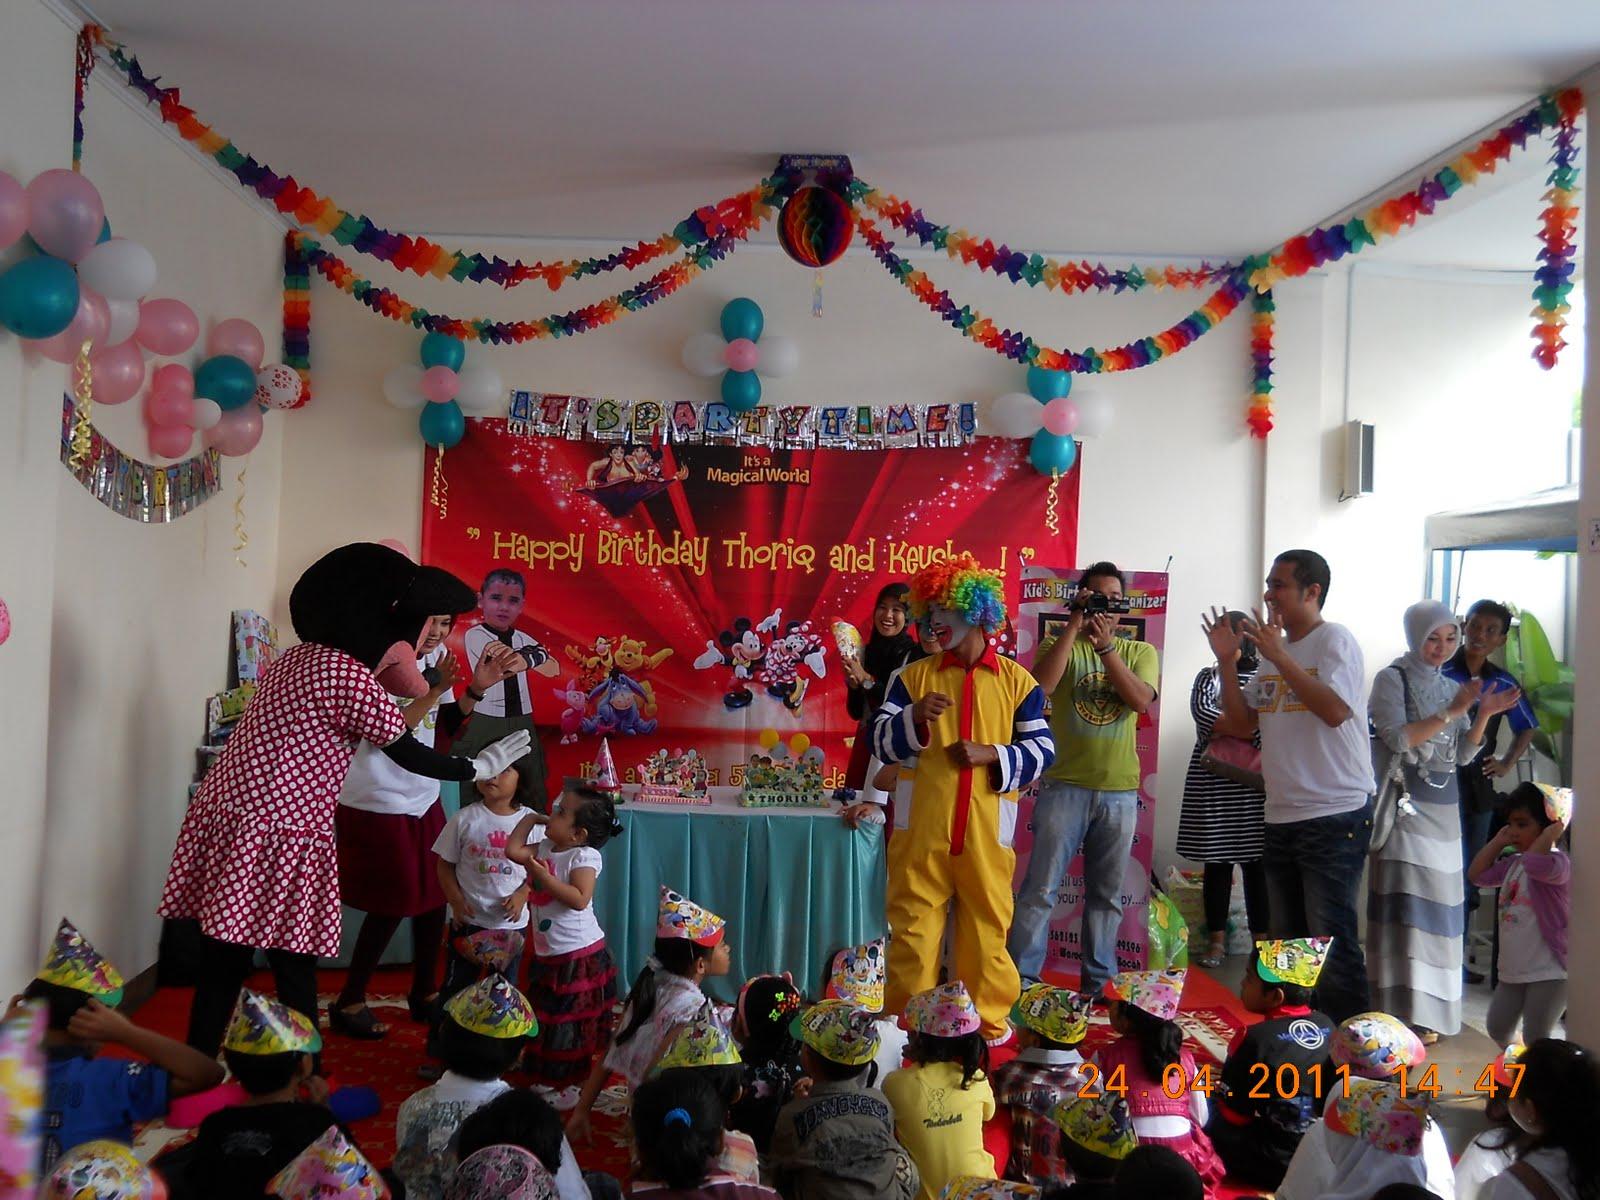 Wakabo Details Dekorasi Pesta Ulang Tahun